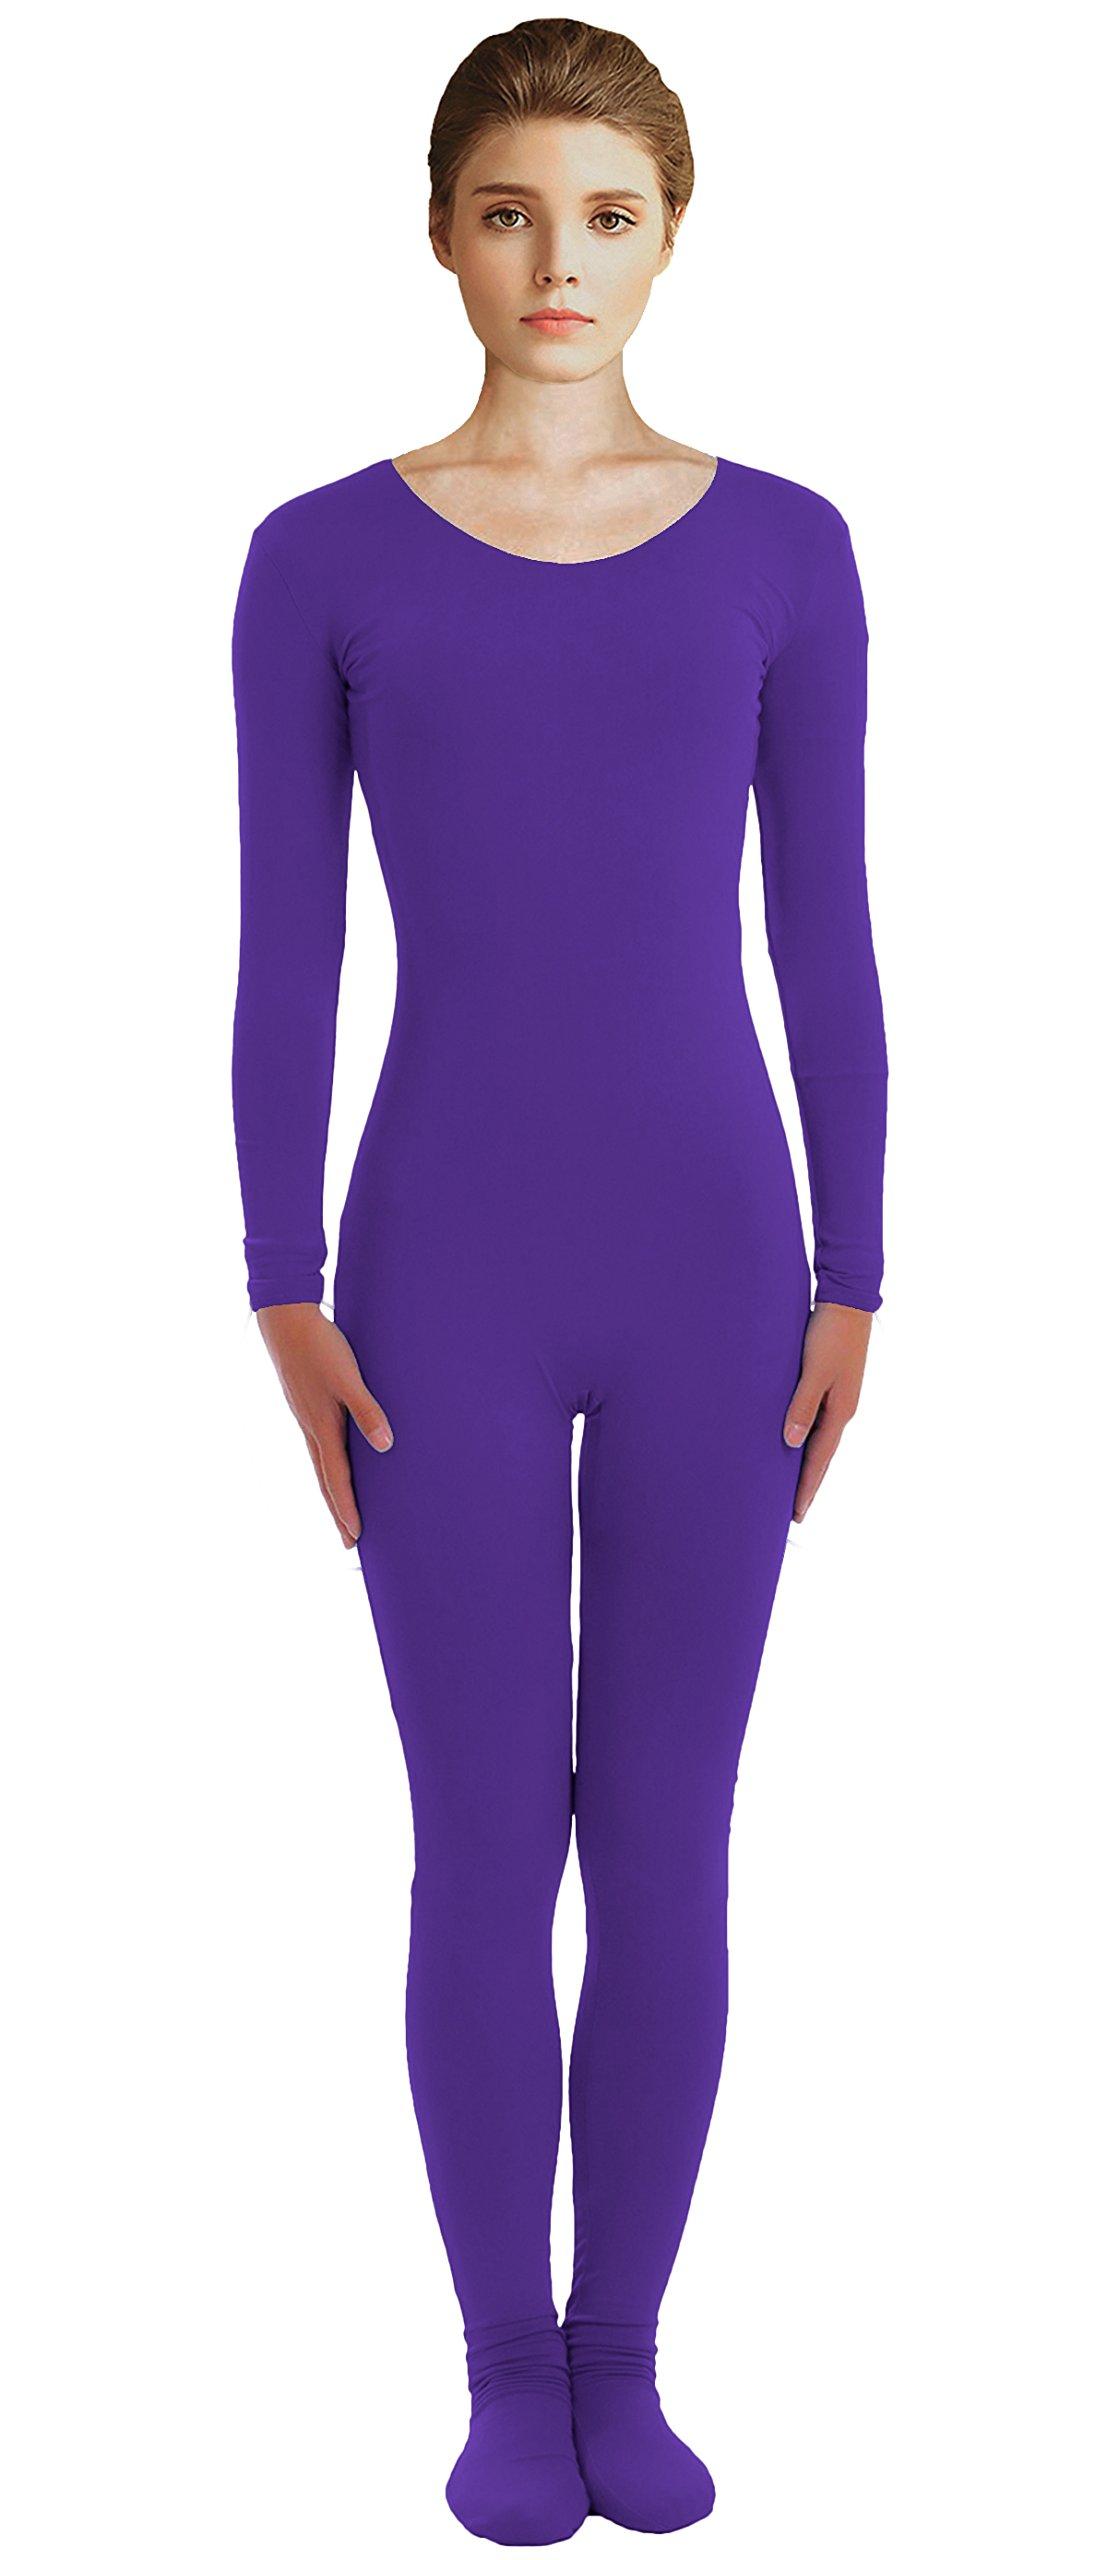 VSVO Adult Purple Scoop Neckline Unitard with Socks Catsuit Dancewear (Medium, Purple) by VSVO